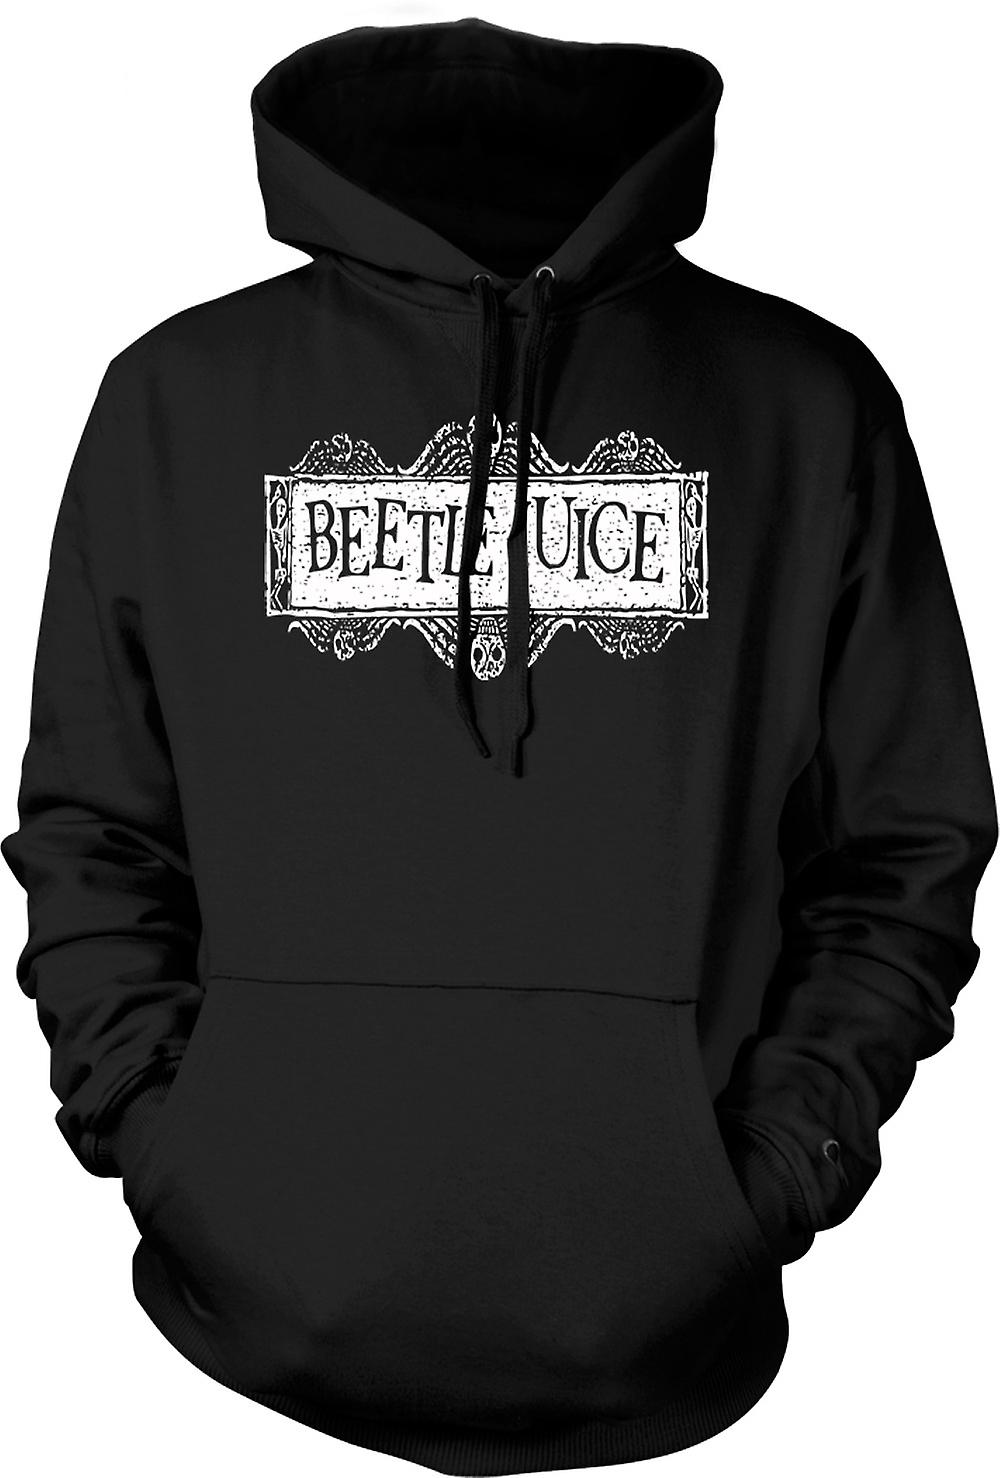 Barna hettegenser - Beetlejuice - komedie - Horror - Funny